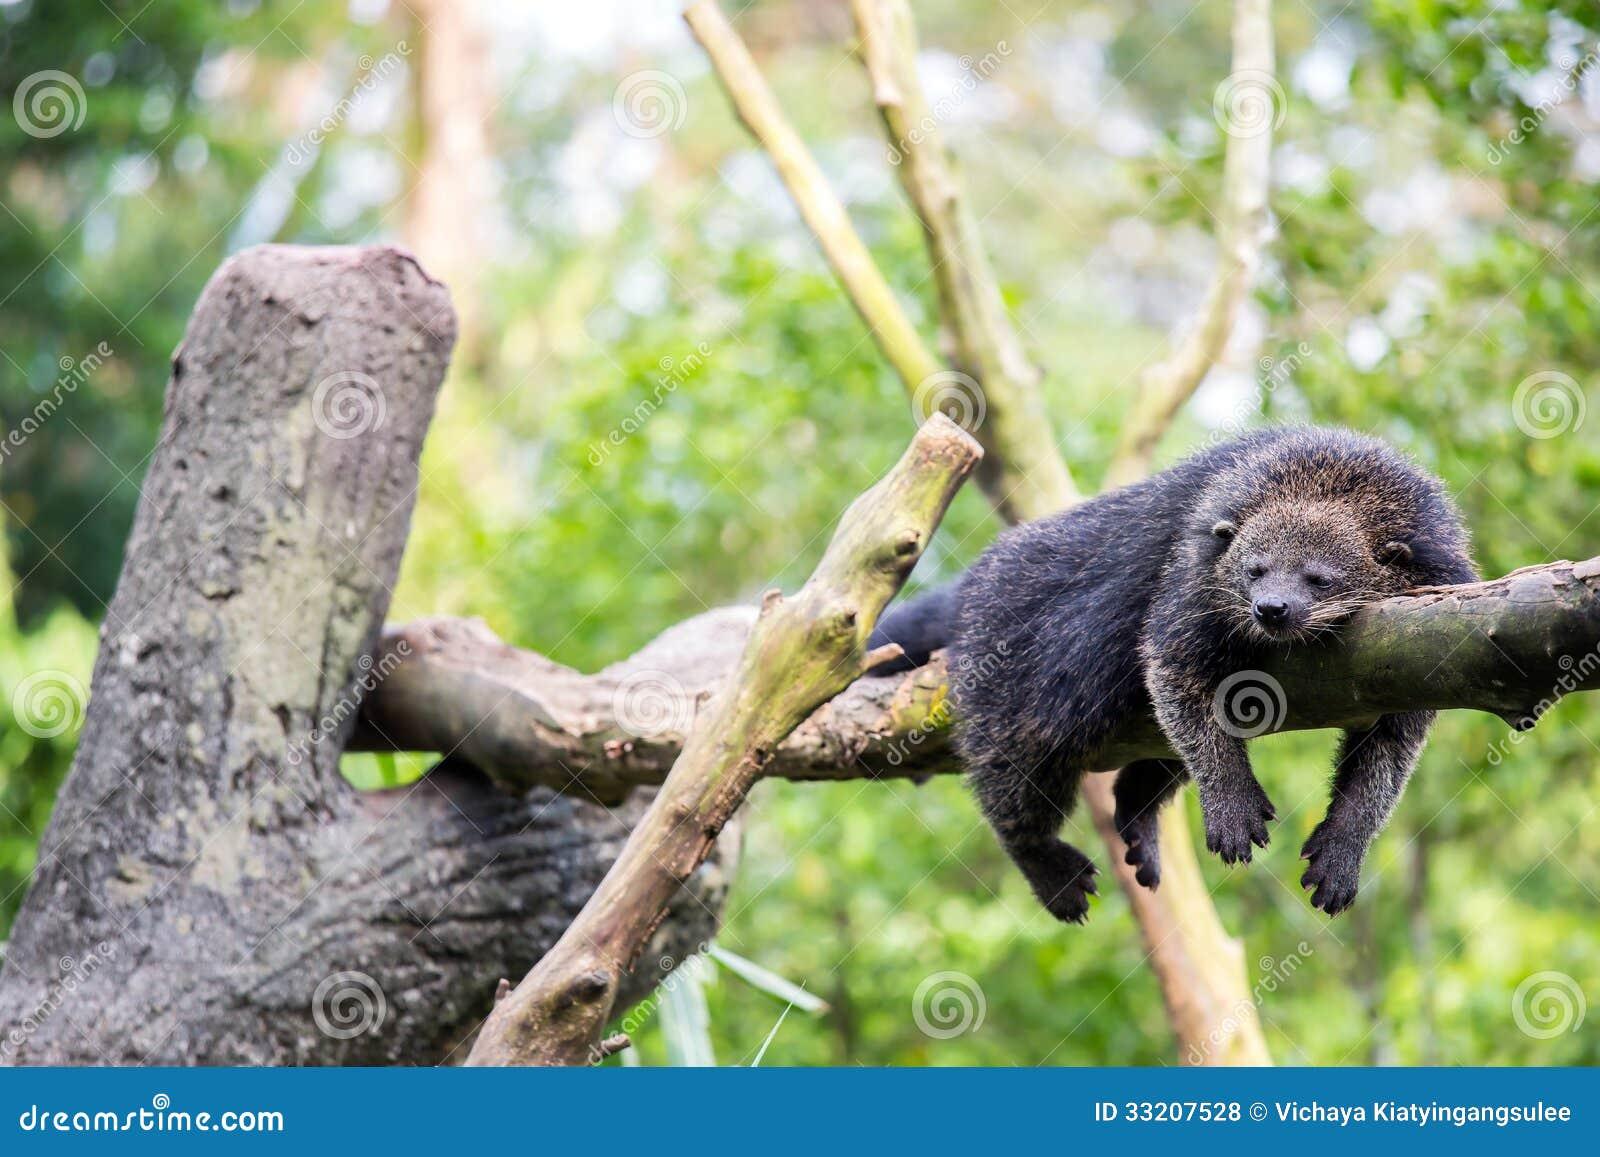 Wild Bearcat Sleeping Royalty Free Stock Photos Image